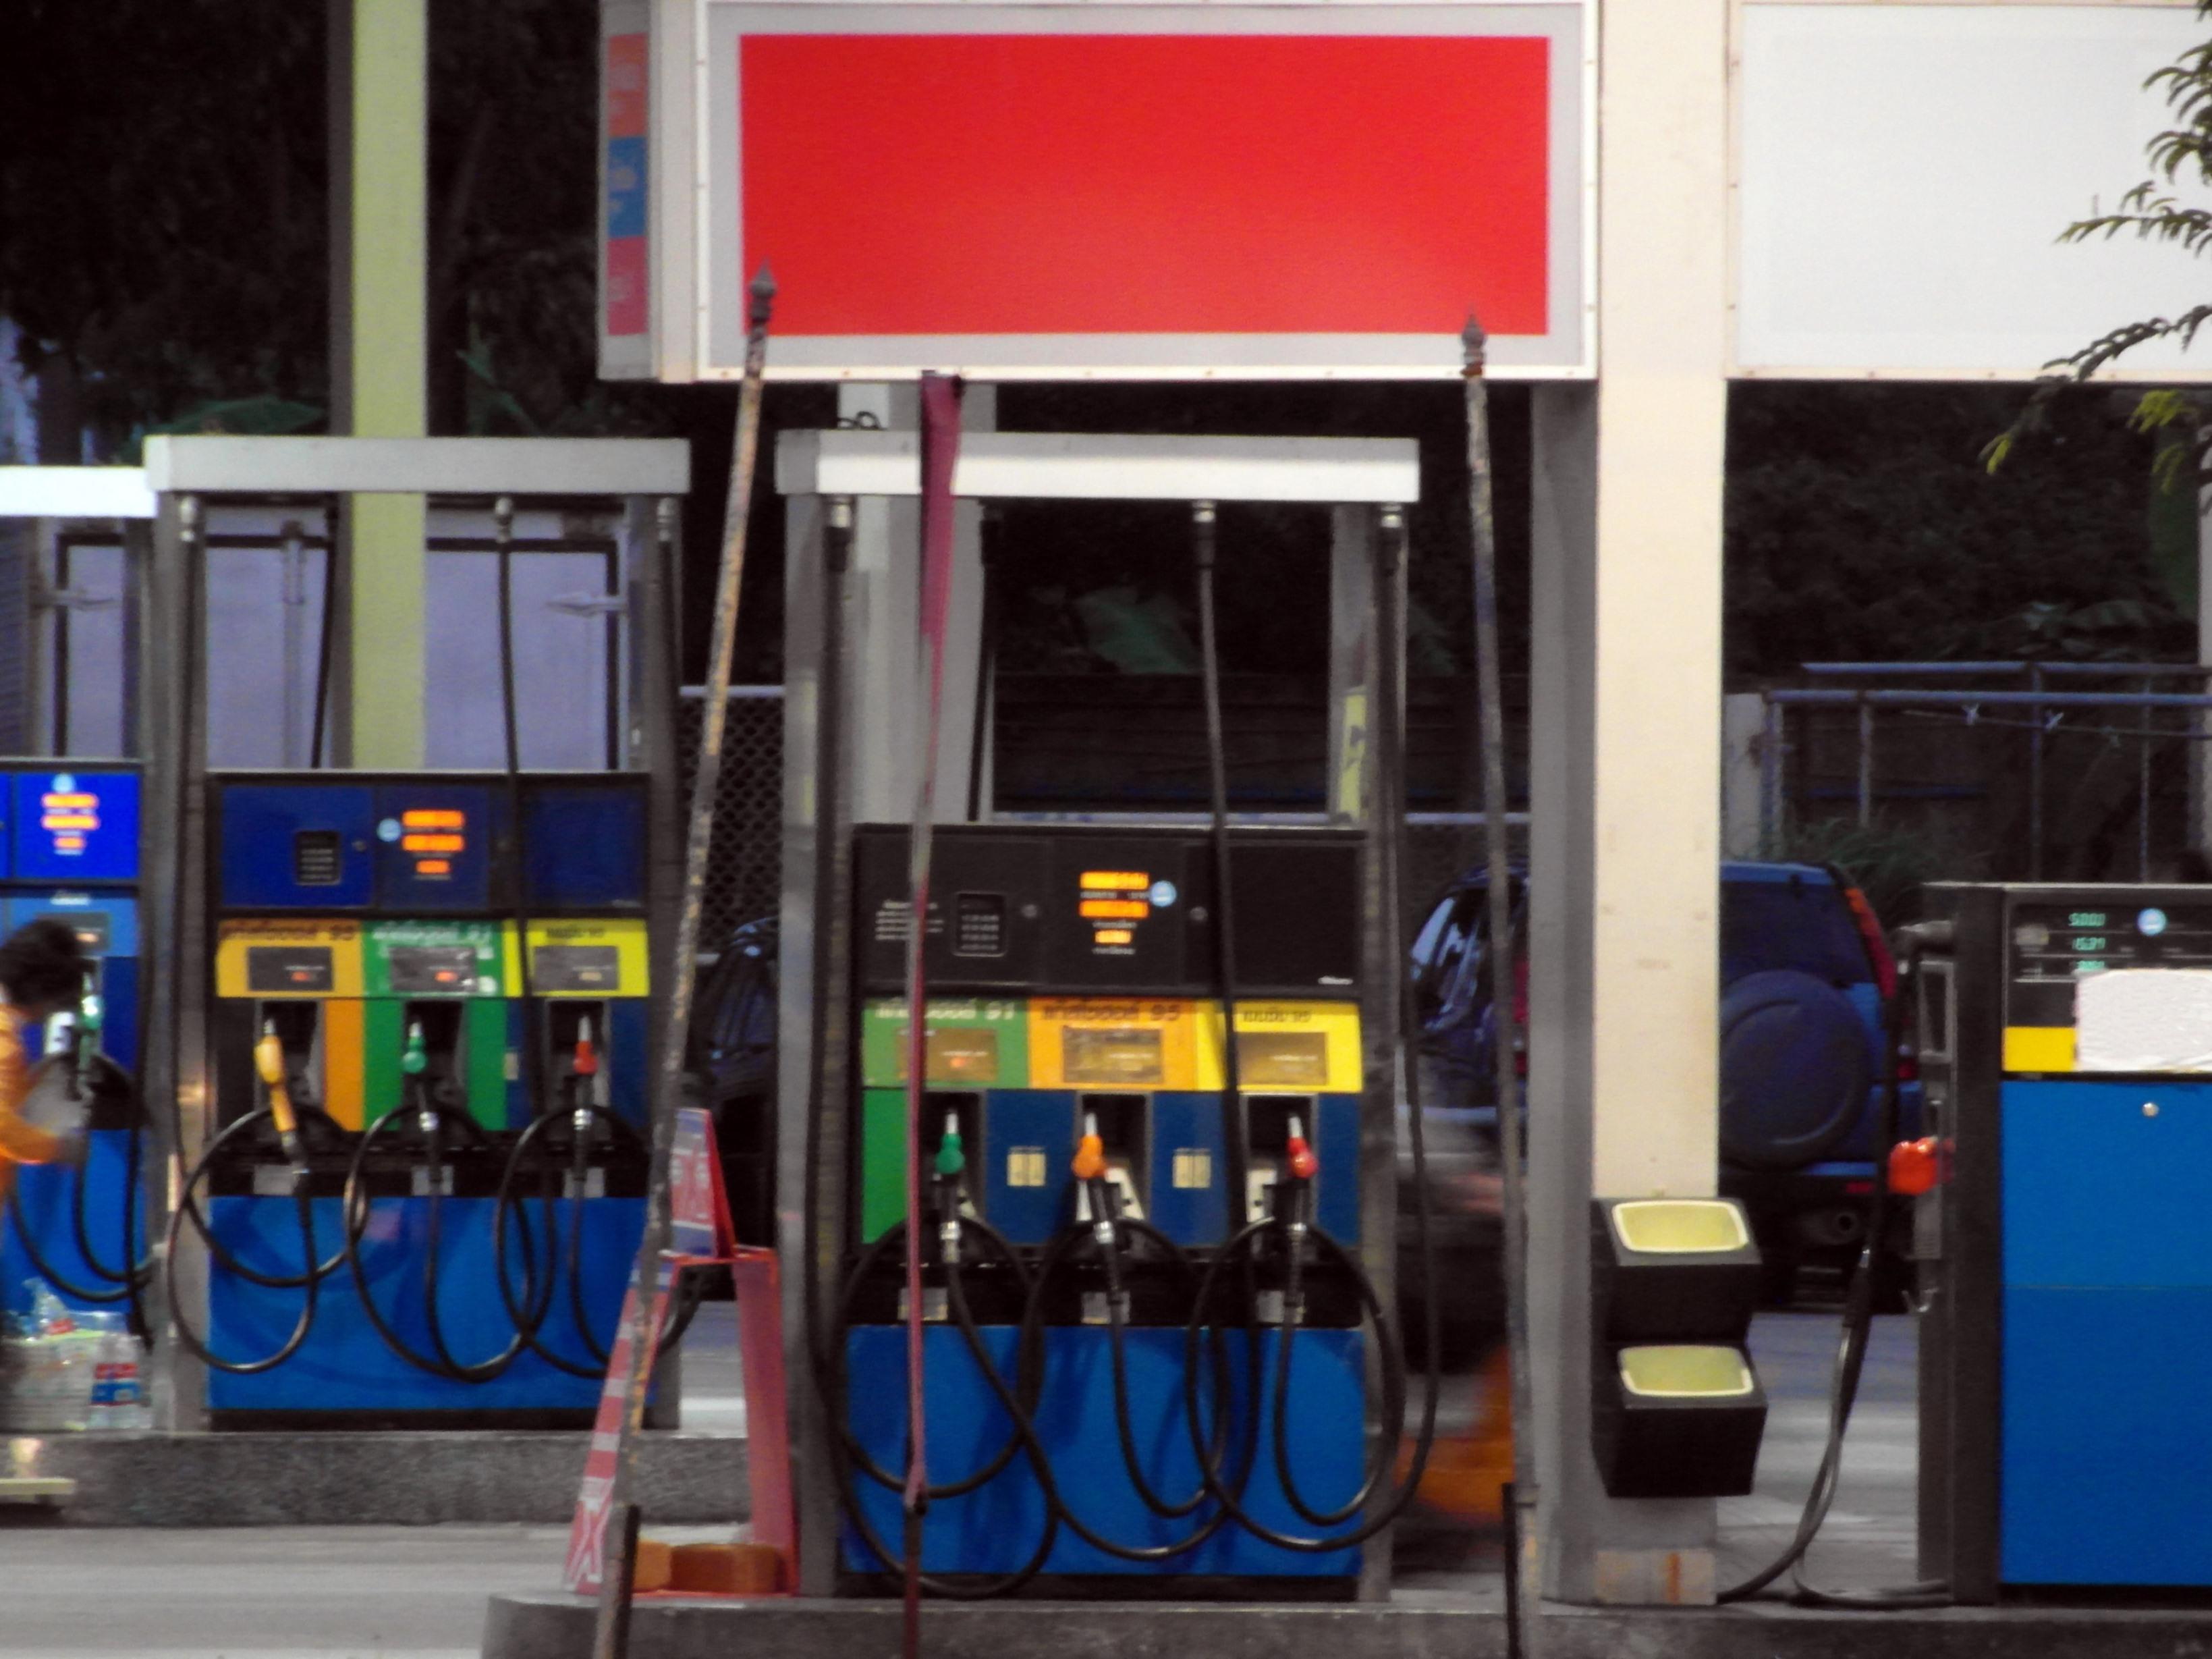 Petrol station pumps photo